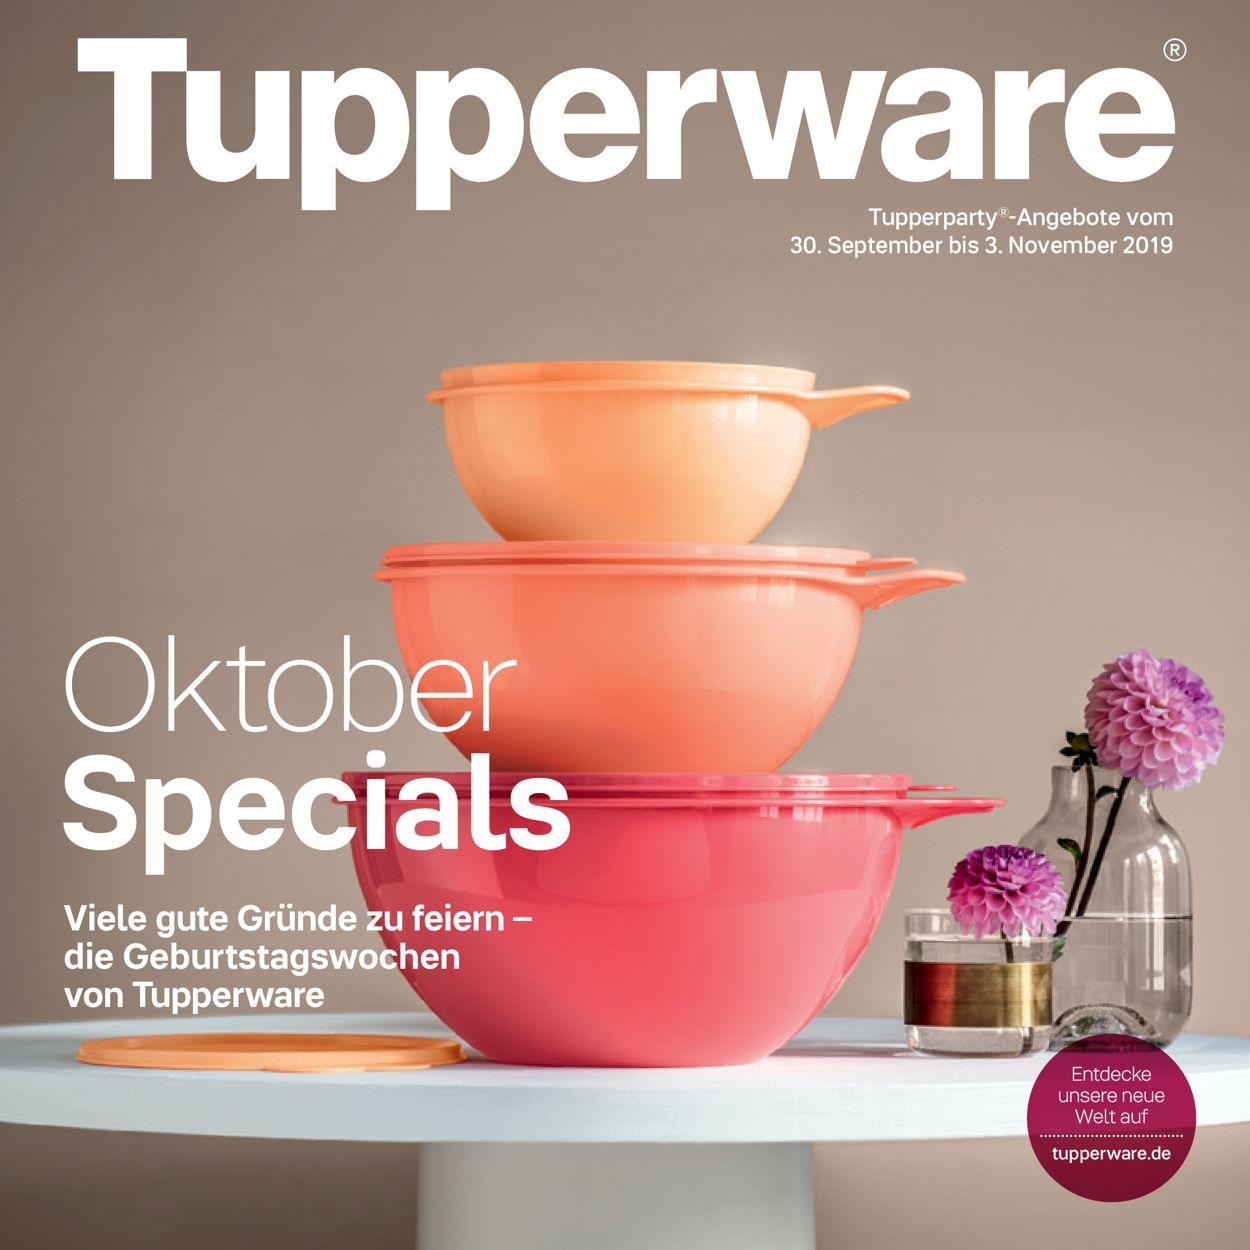 tupperware.at aktuelle angebote